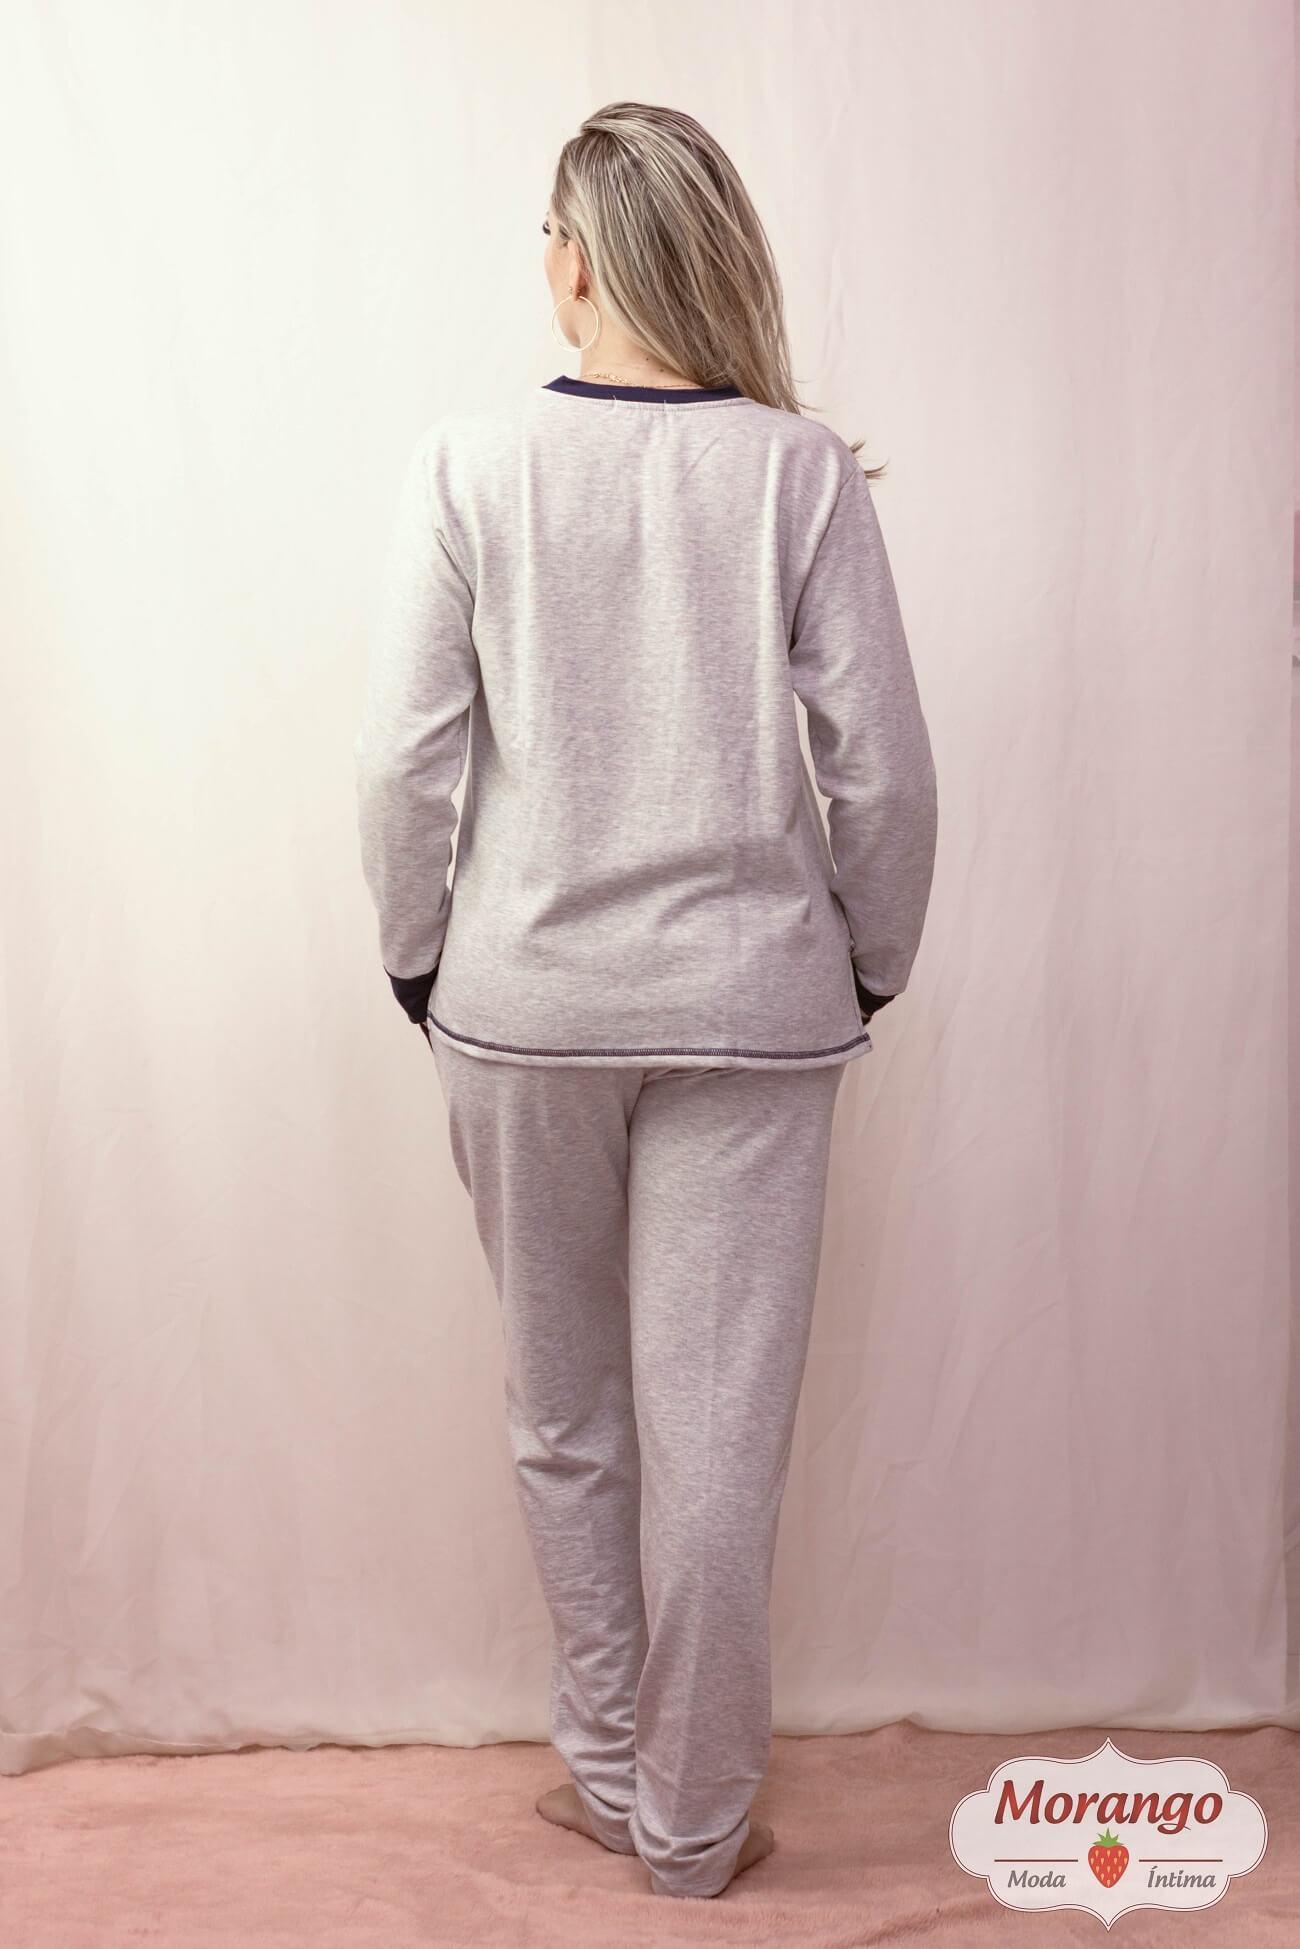 Pijama 205164 Pluma Strech Gola Careca Manga Longa